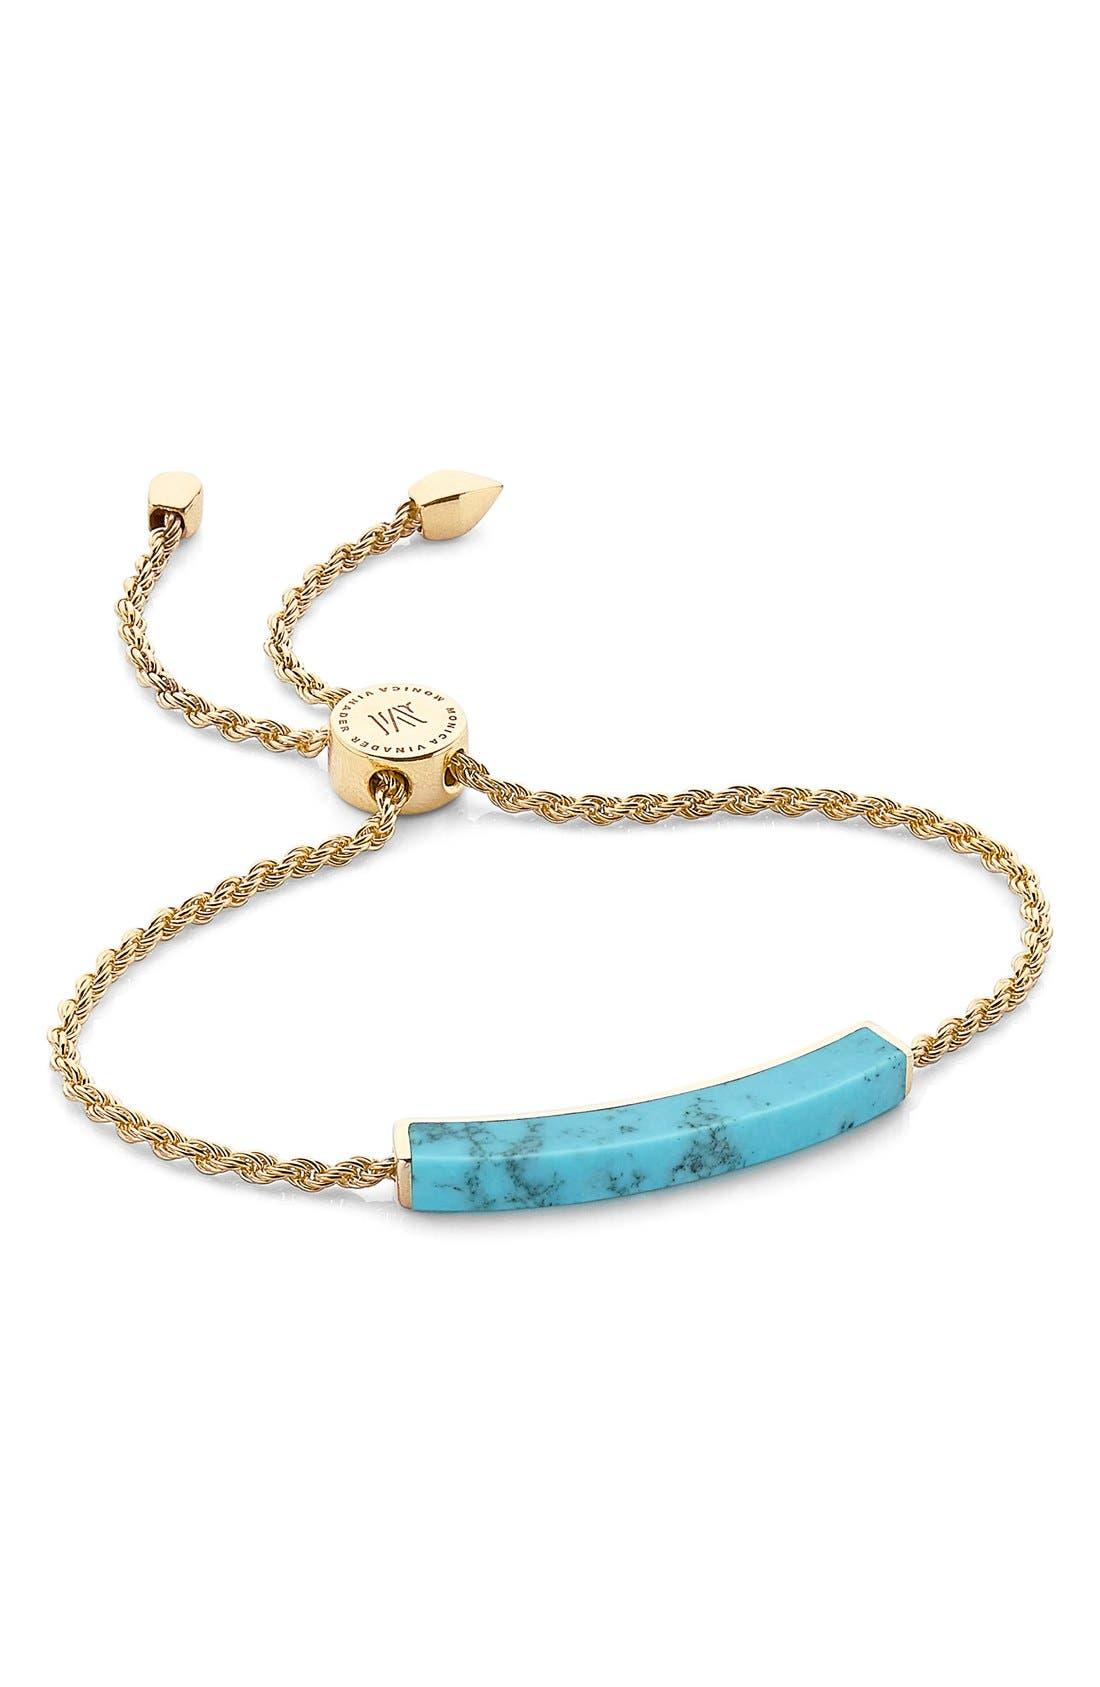 Main Image - Monica Vinader Linear Semiprecious Stone Bracelet